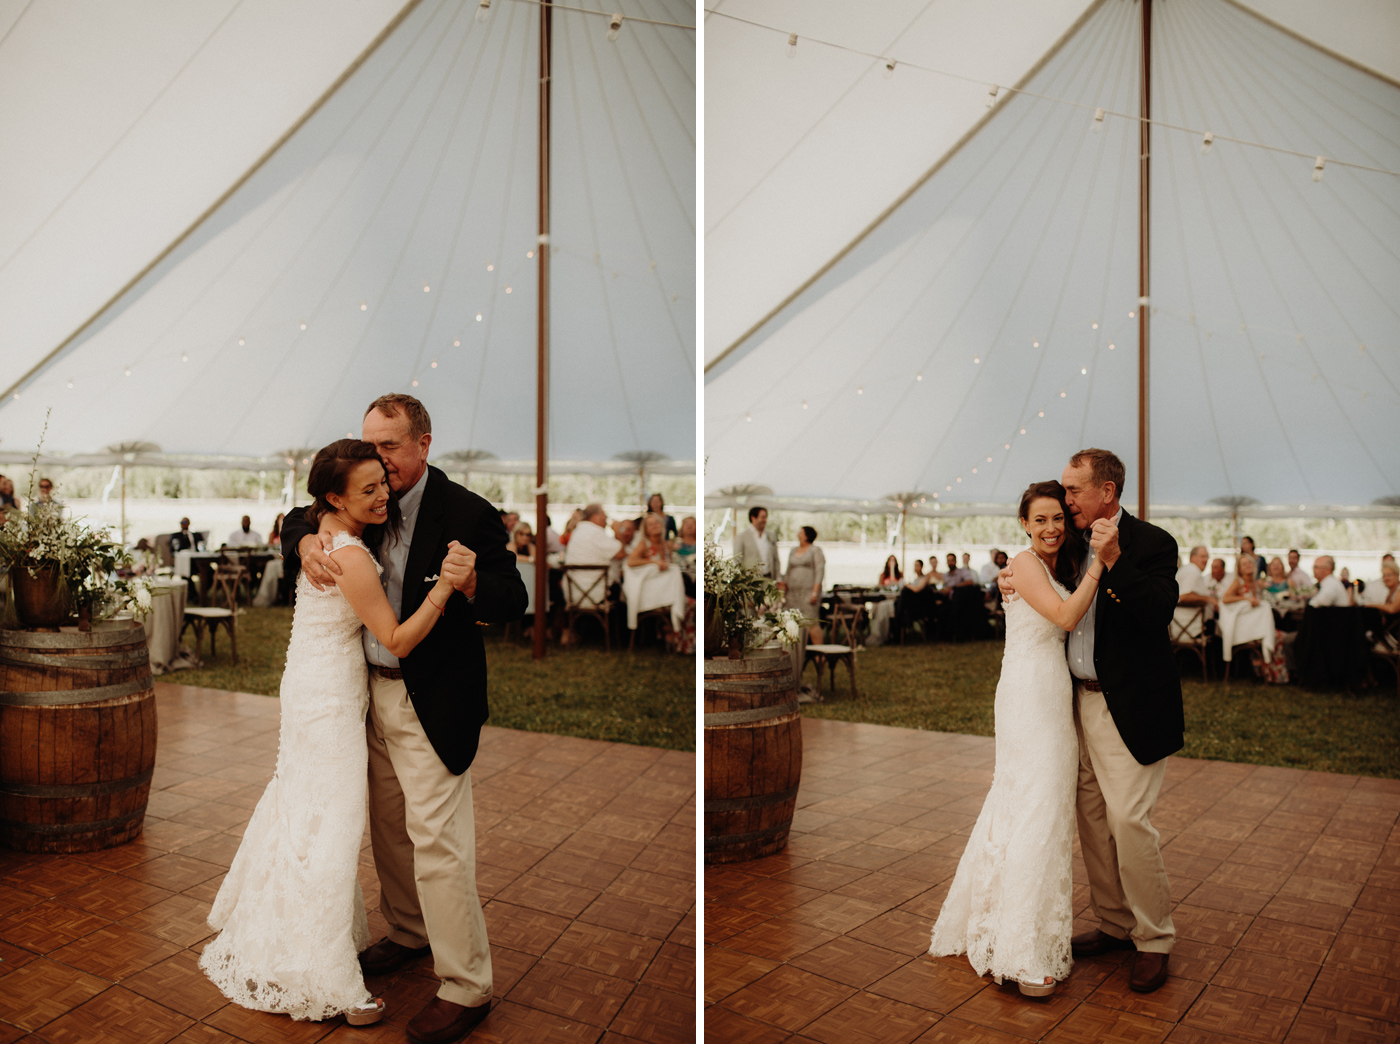 081-grand-teton-jackson-hole-wyoming-wedding.jpg